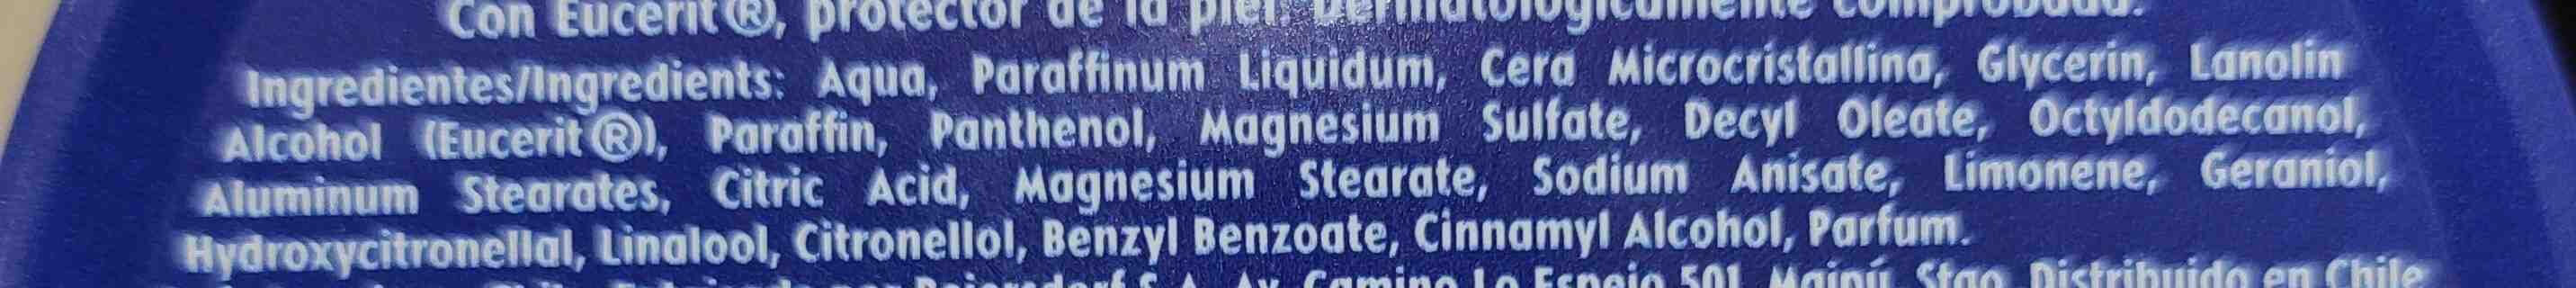 NIVEA Creme - Ingredients - en